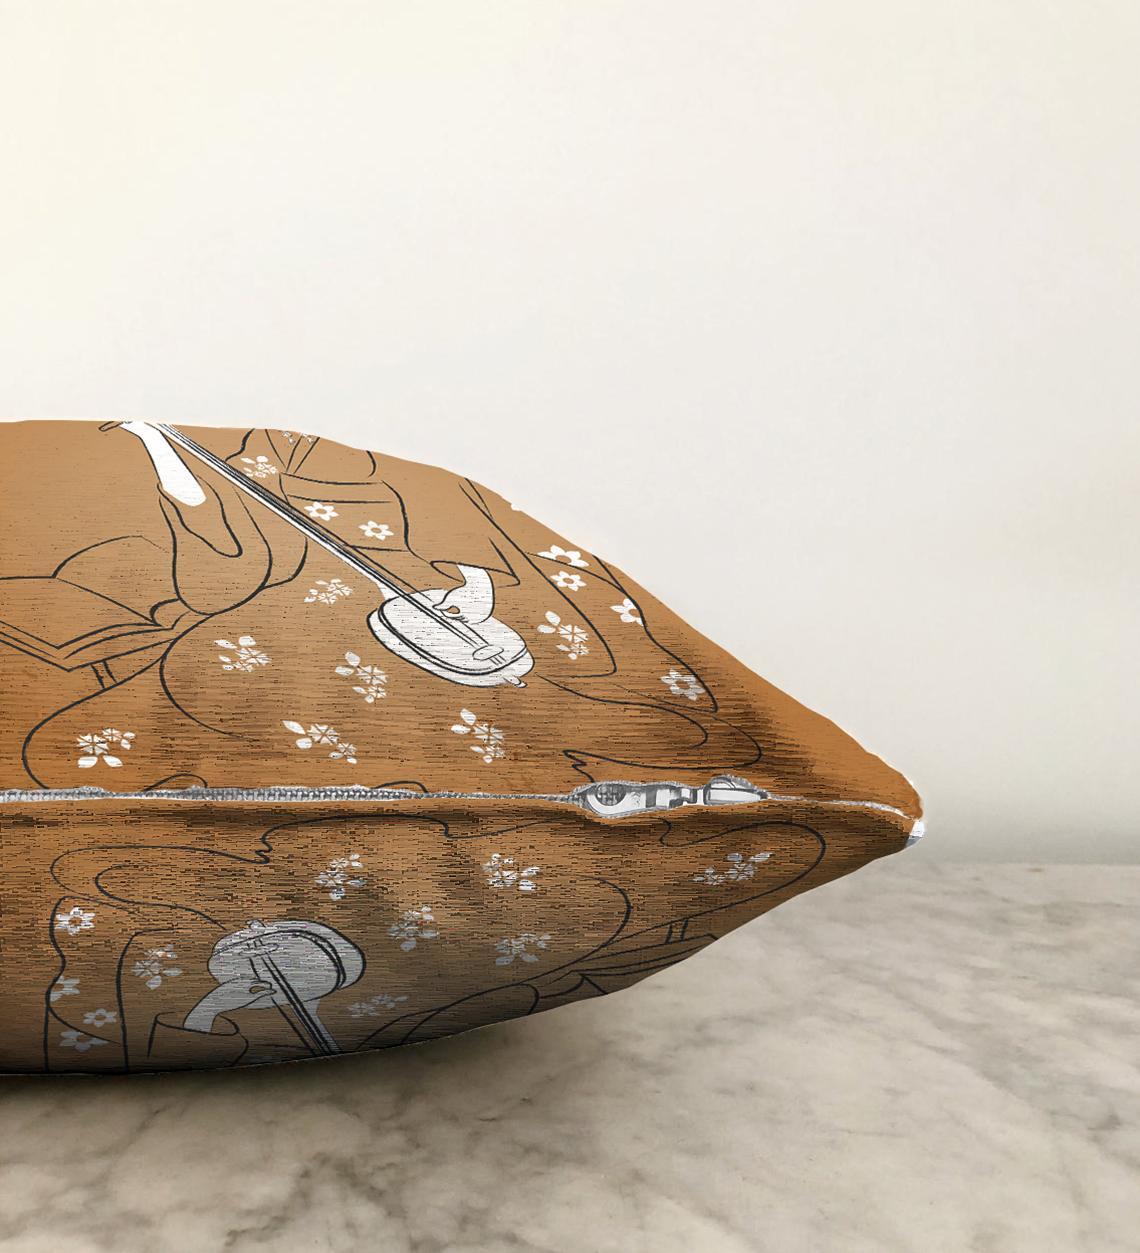 Realhomes Çift Taraflı Dijital Baskılı Özel Tasarım Dekoratif Modern Şönil Kırlent Kılıfı - 55 x 55 cm Realhomes